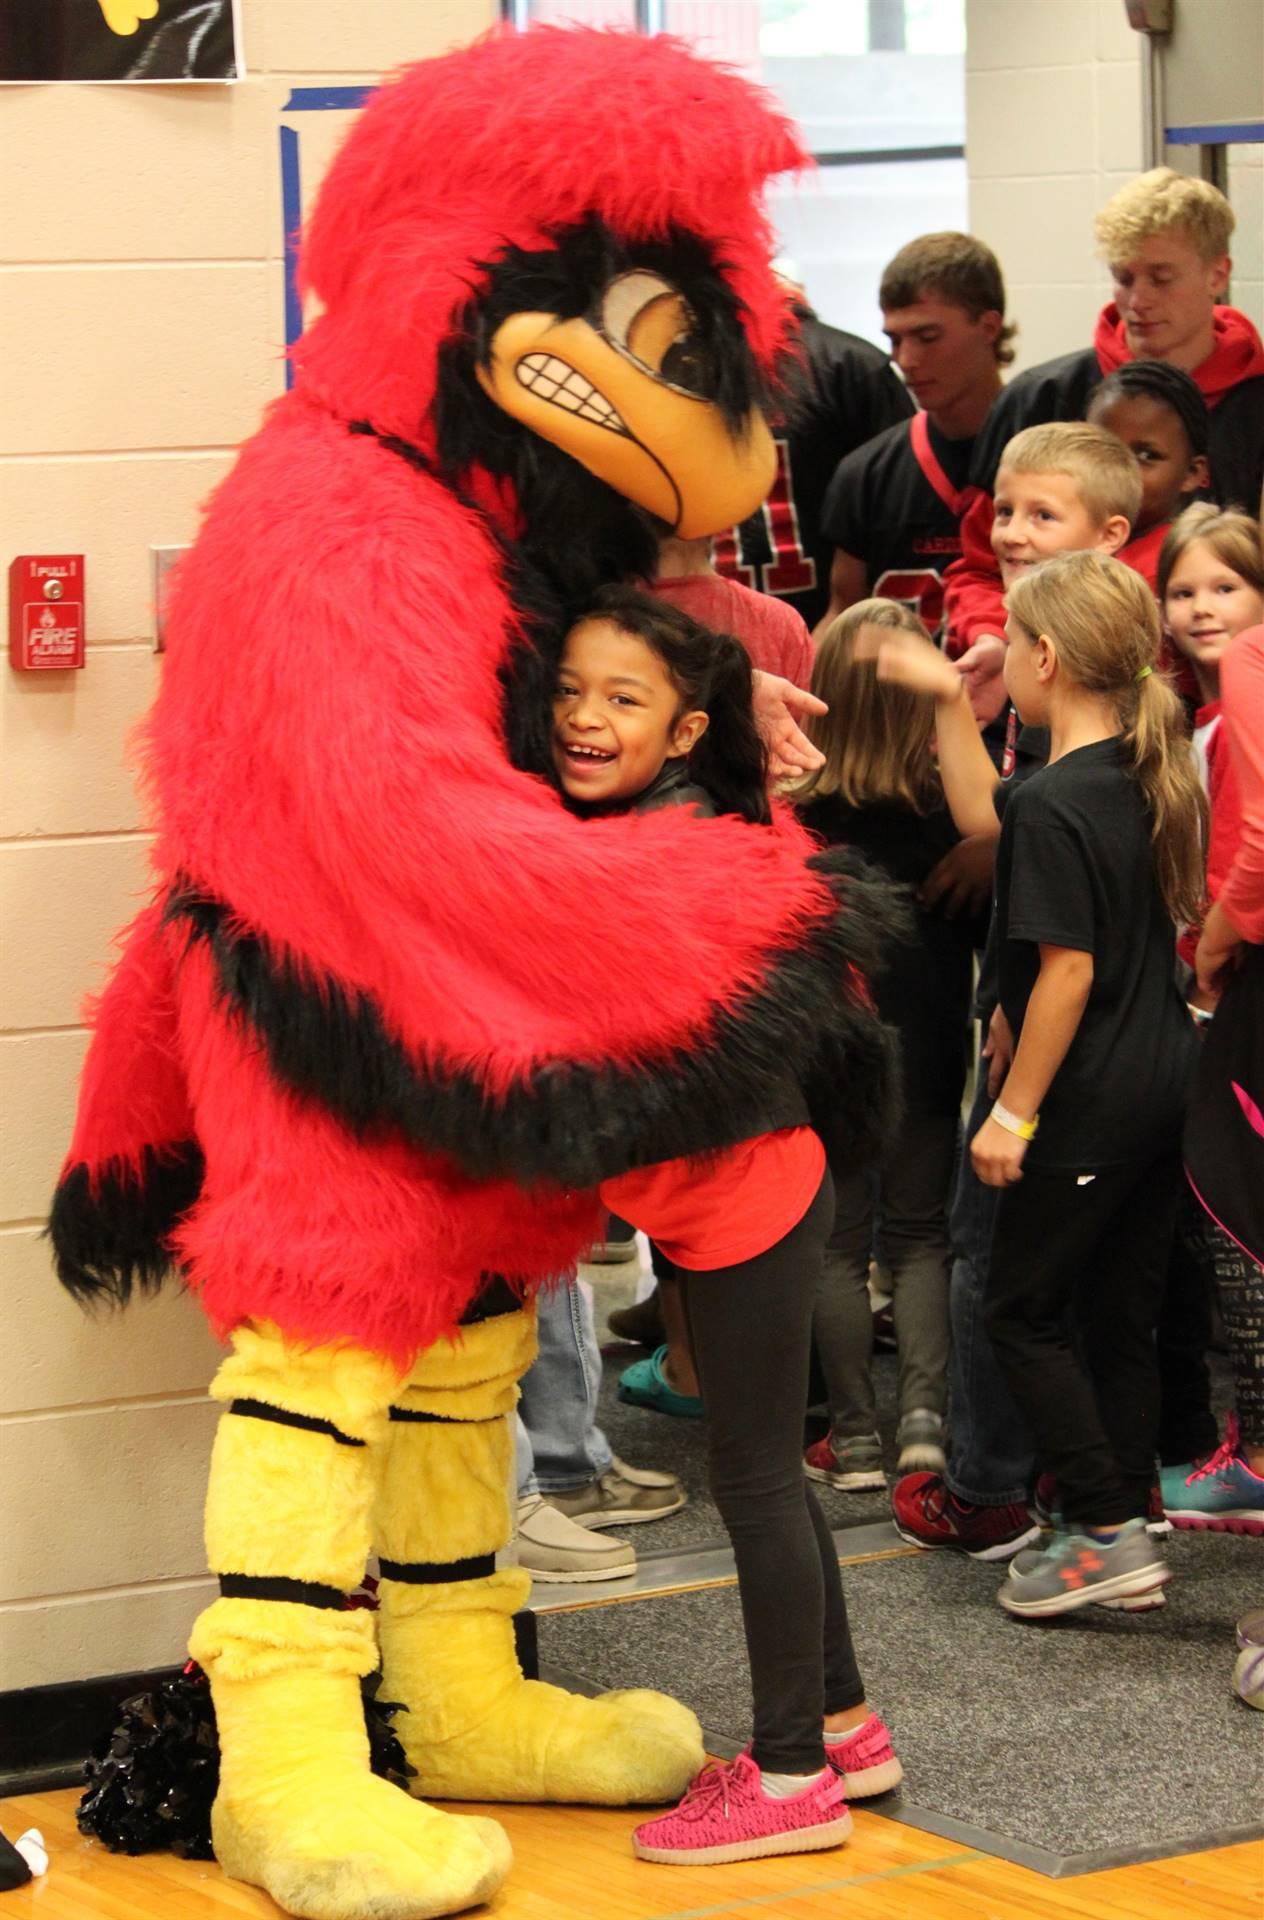 Elementary student hugging school mascot